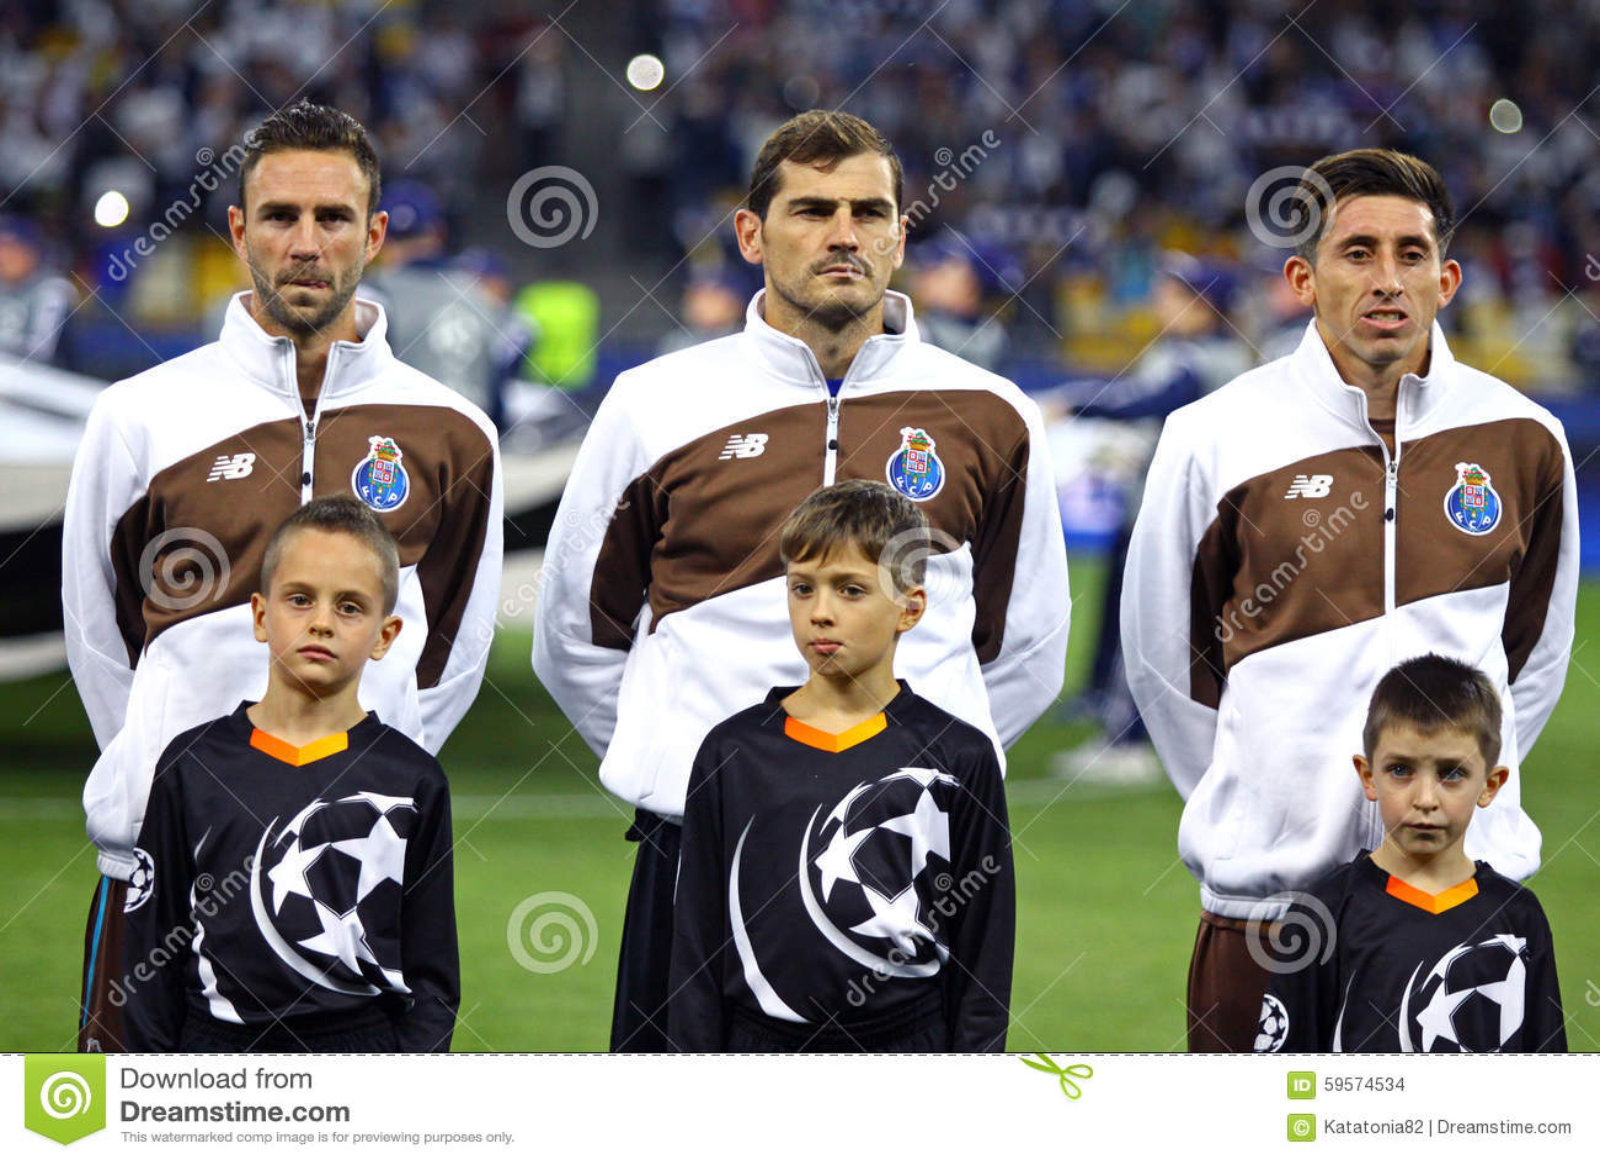 ¿Cuánto mide Héctor Herrera? Miguel-layun-iker-casillas-hector-herrera-fc-porto-kyiv-ukraine-september-players-listen-official-anthem-uefa-59574534